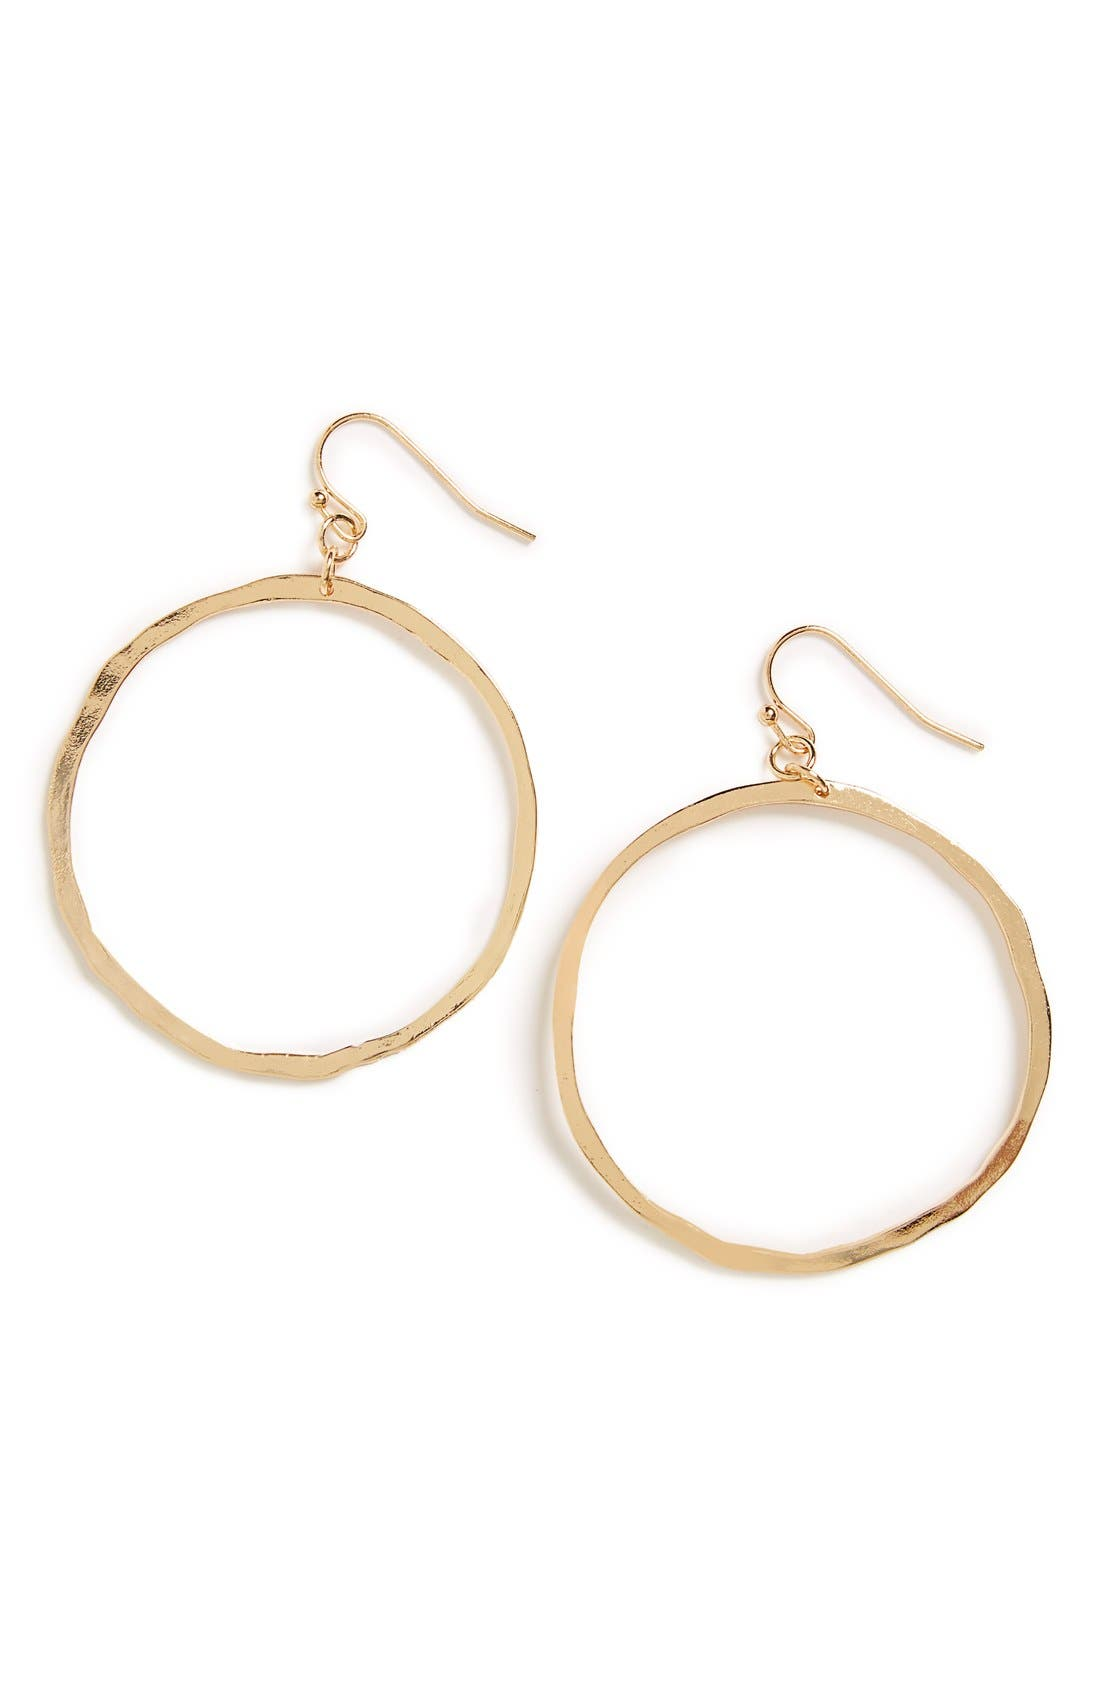 Alternate Image 1 Selected - BP. Hammered Circle Earrings